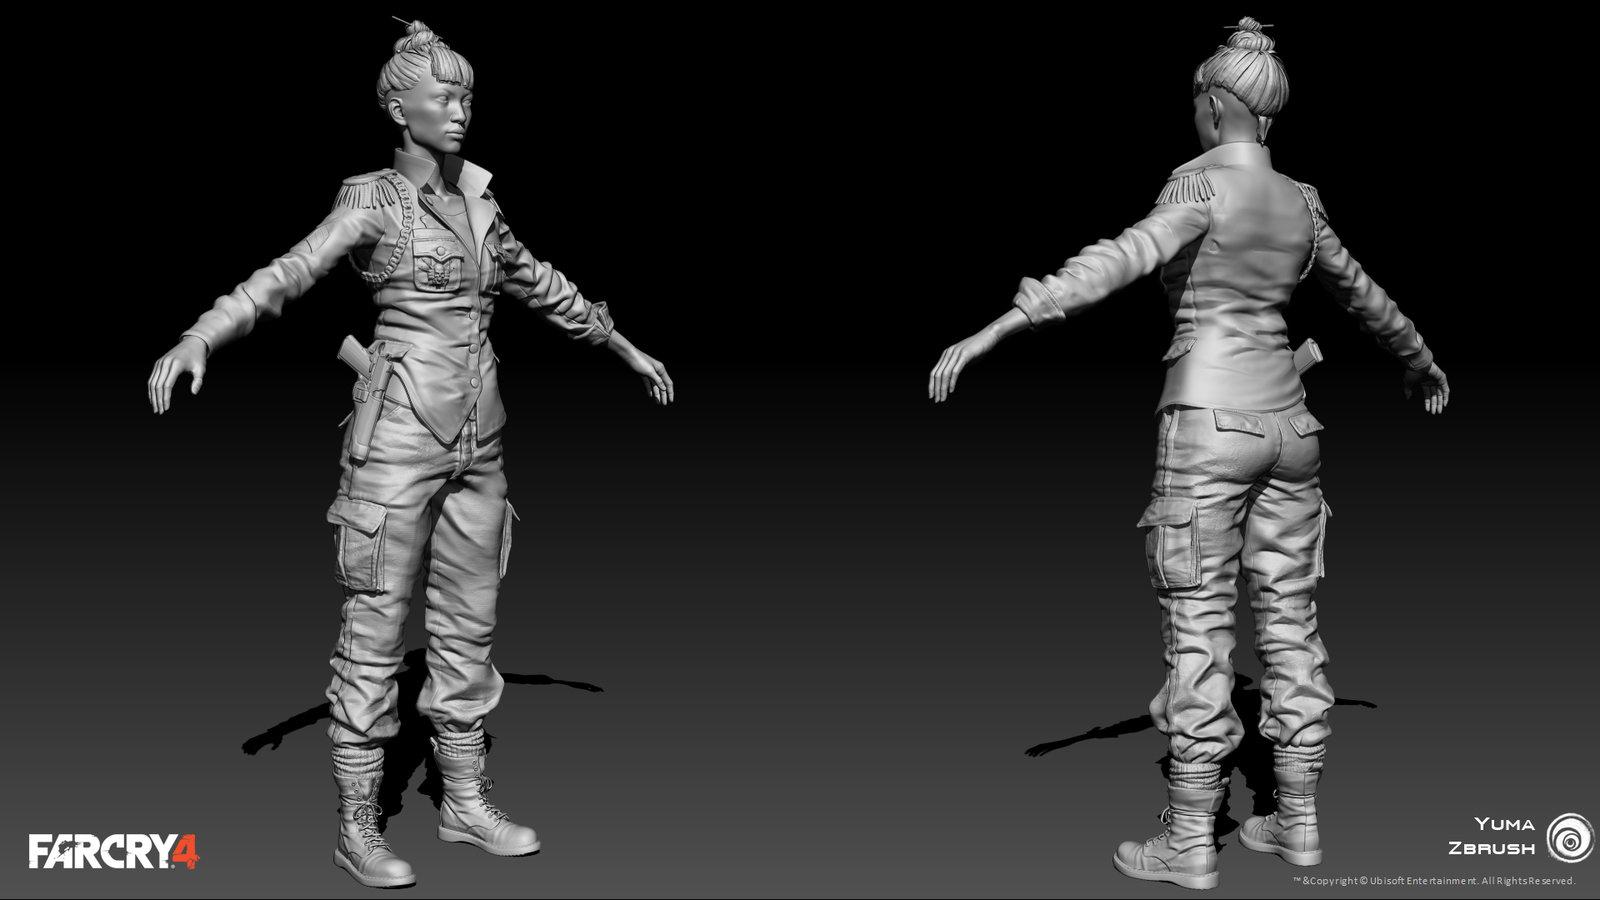 Zbrush Body Model *Head by Mager Kamel Aquino